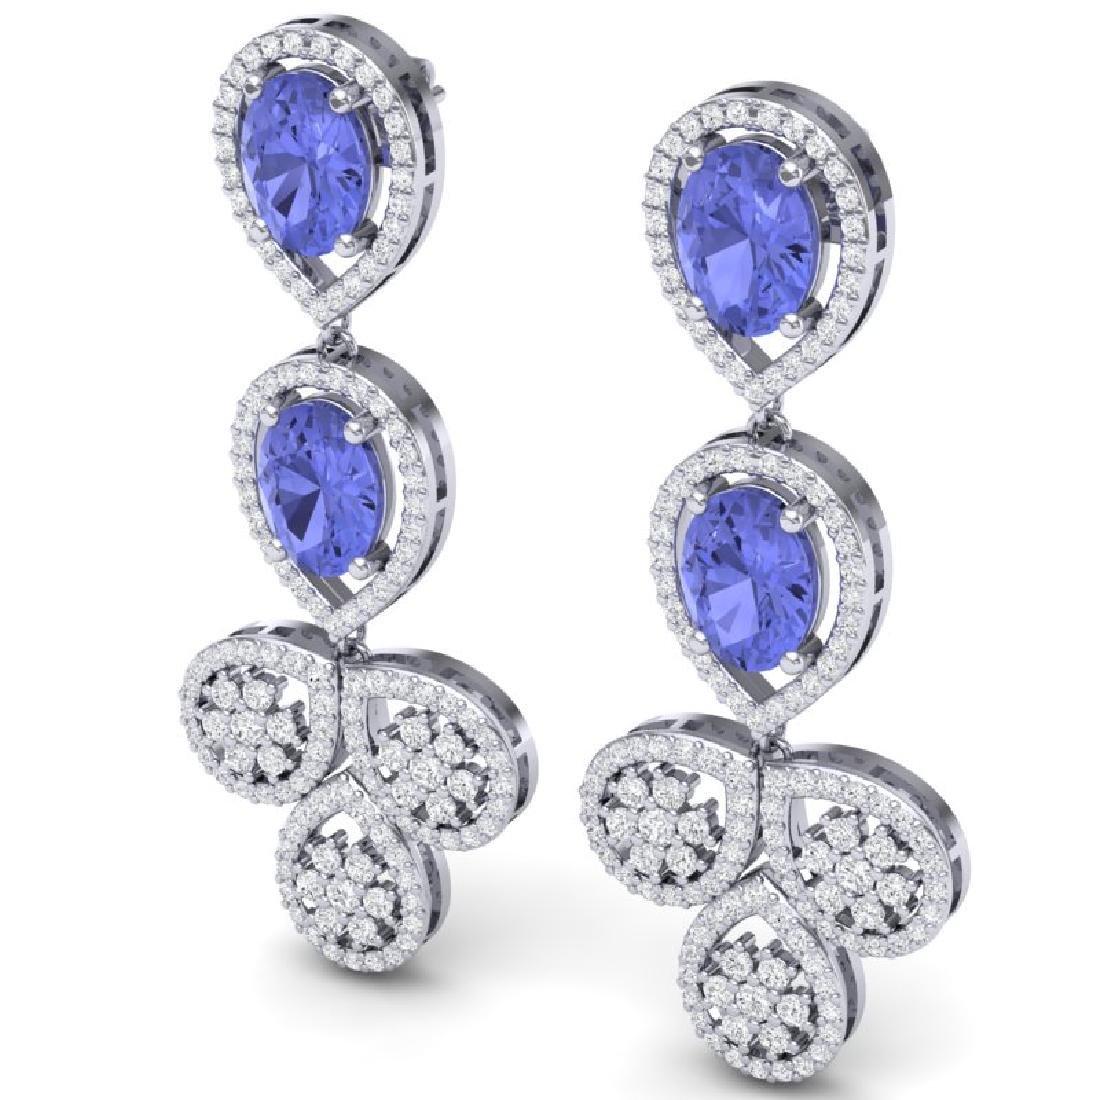 8.75 CTW Royalty Tanzanite & VS Diamond Earrings 18K - 2